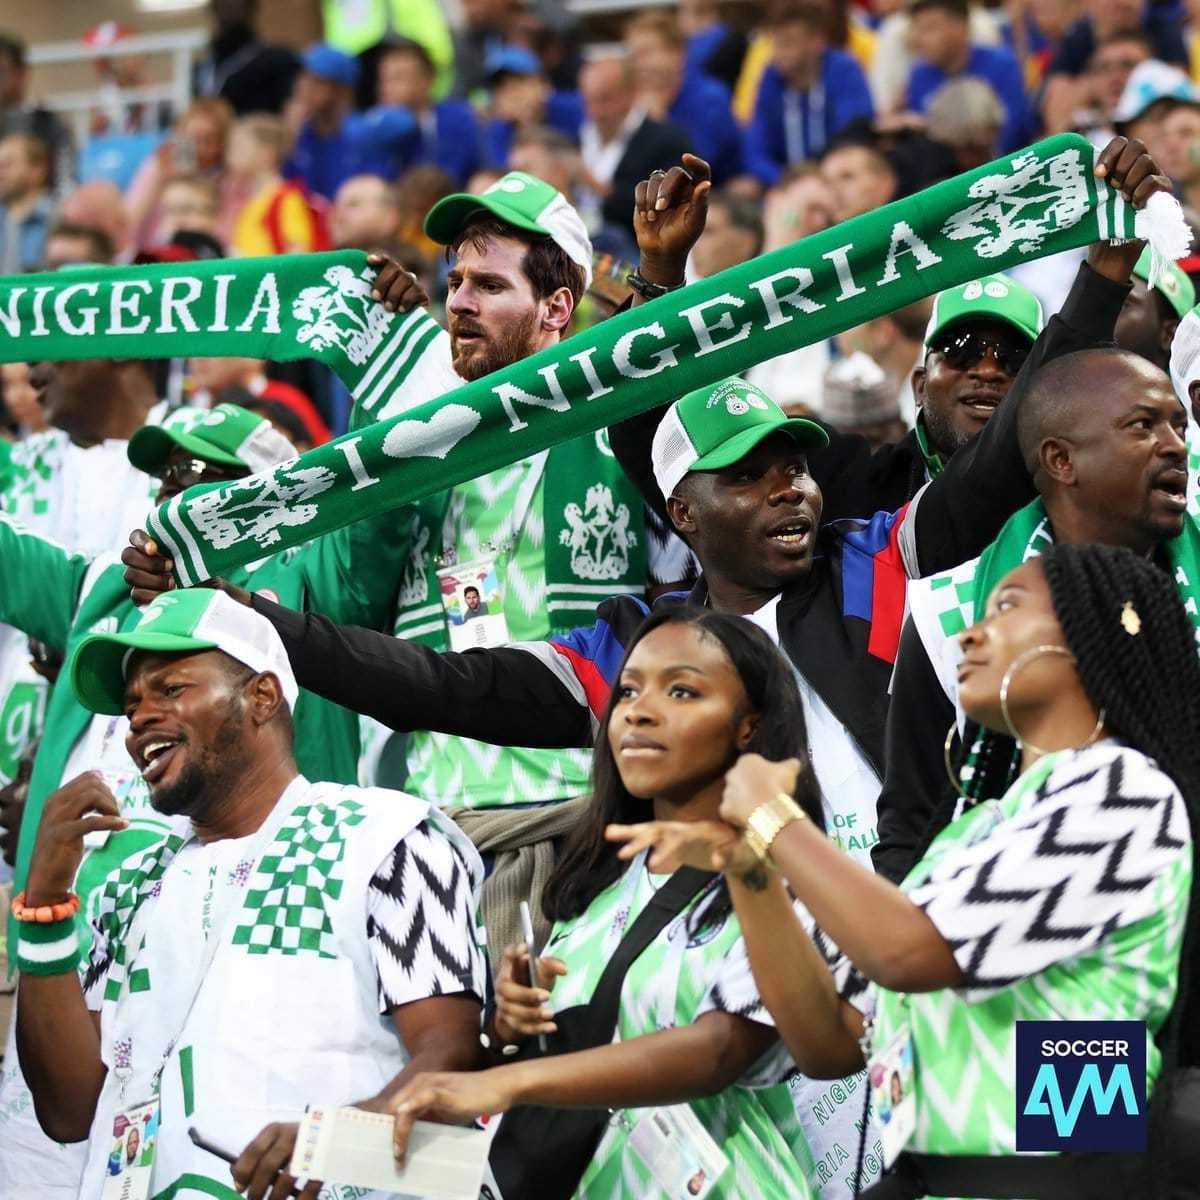 Messi en nigeria - meme